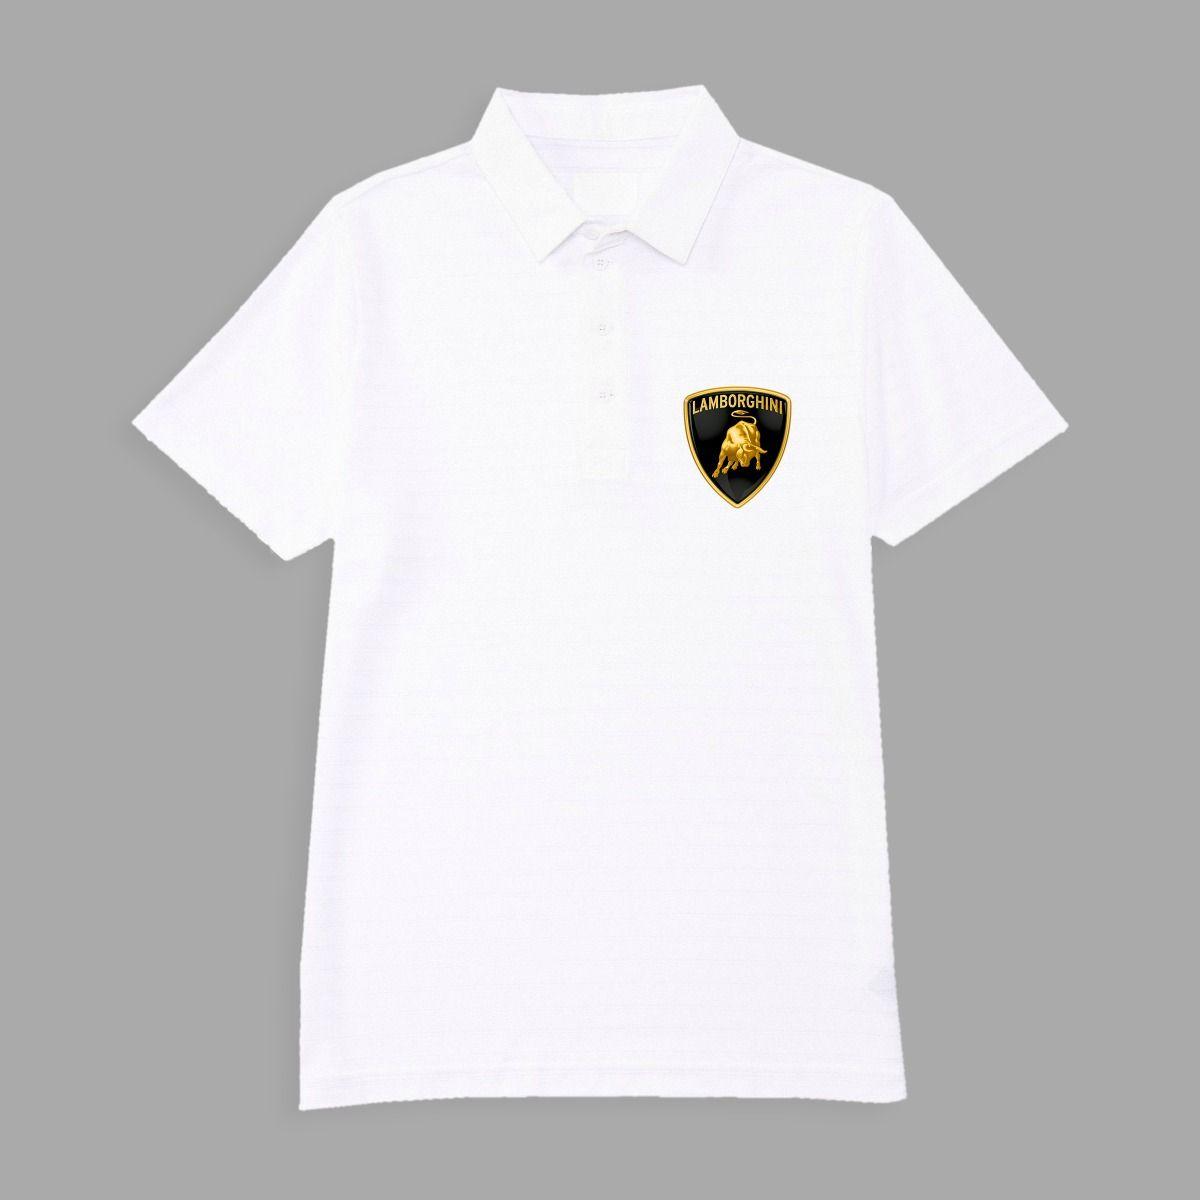 Insta Print All T-Shirt Non Custom